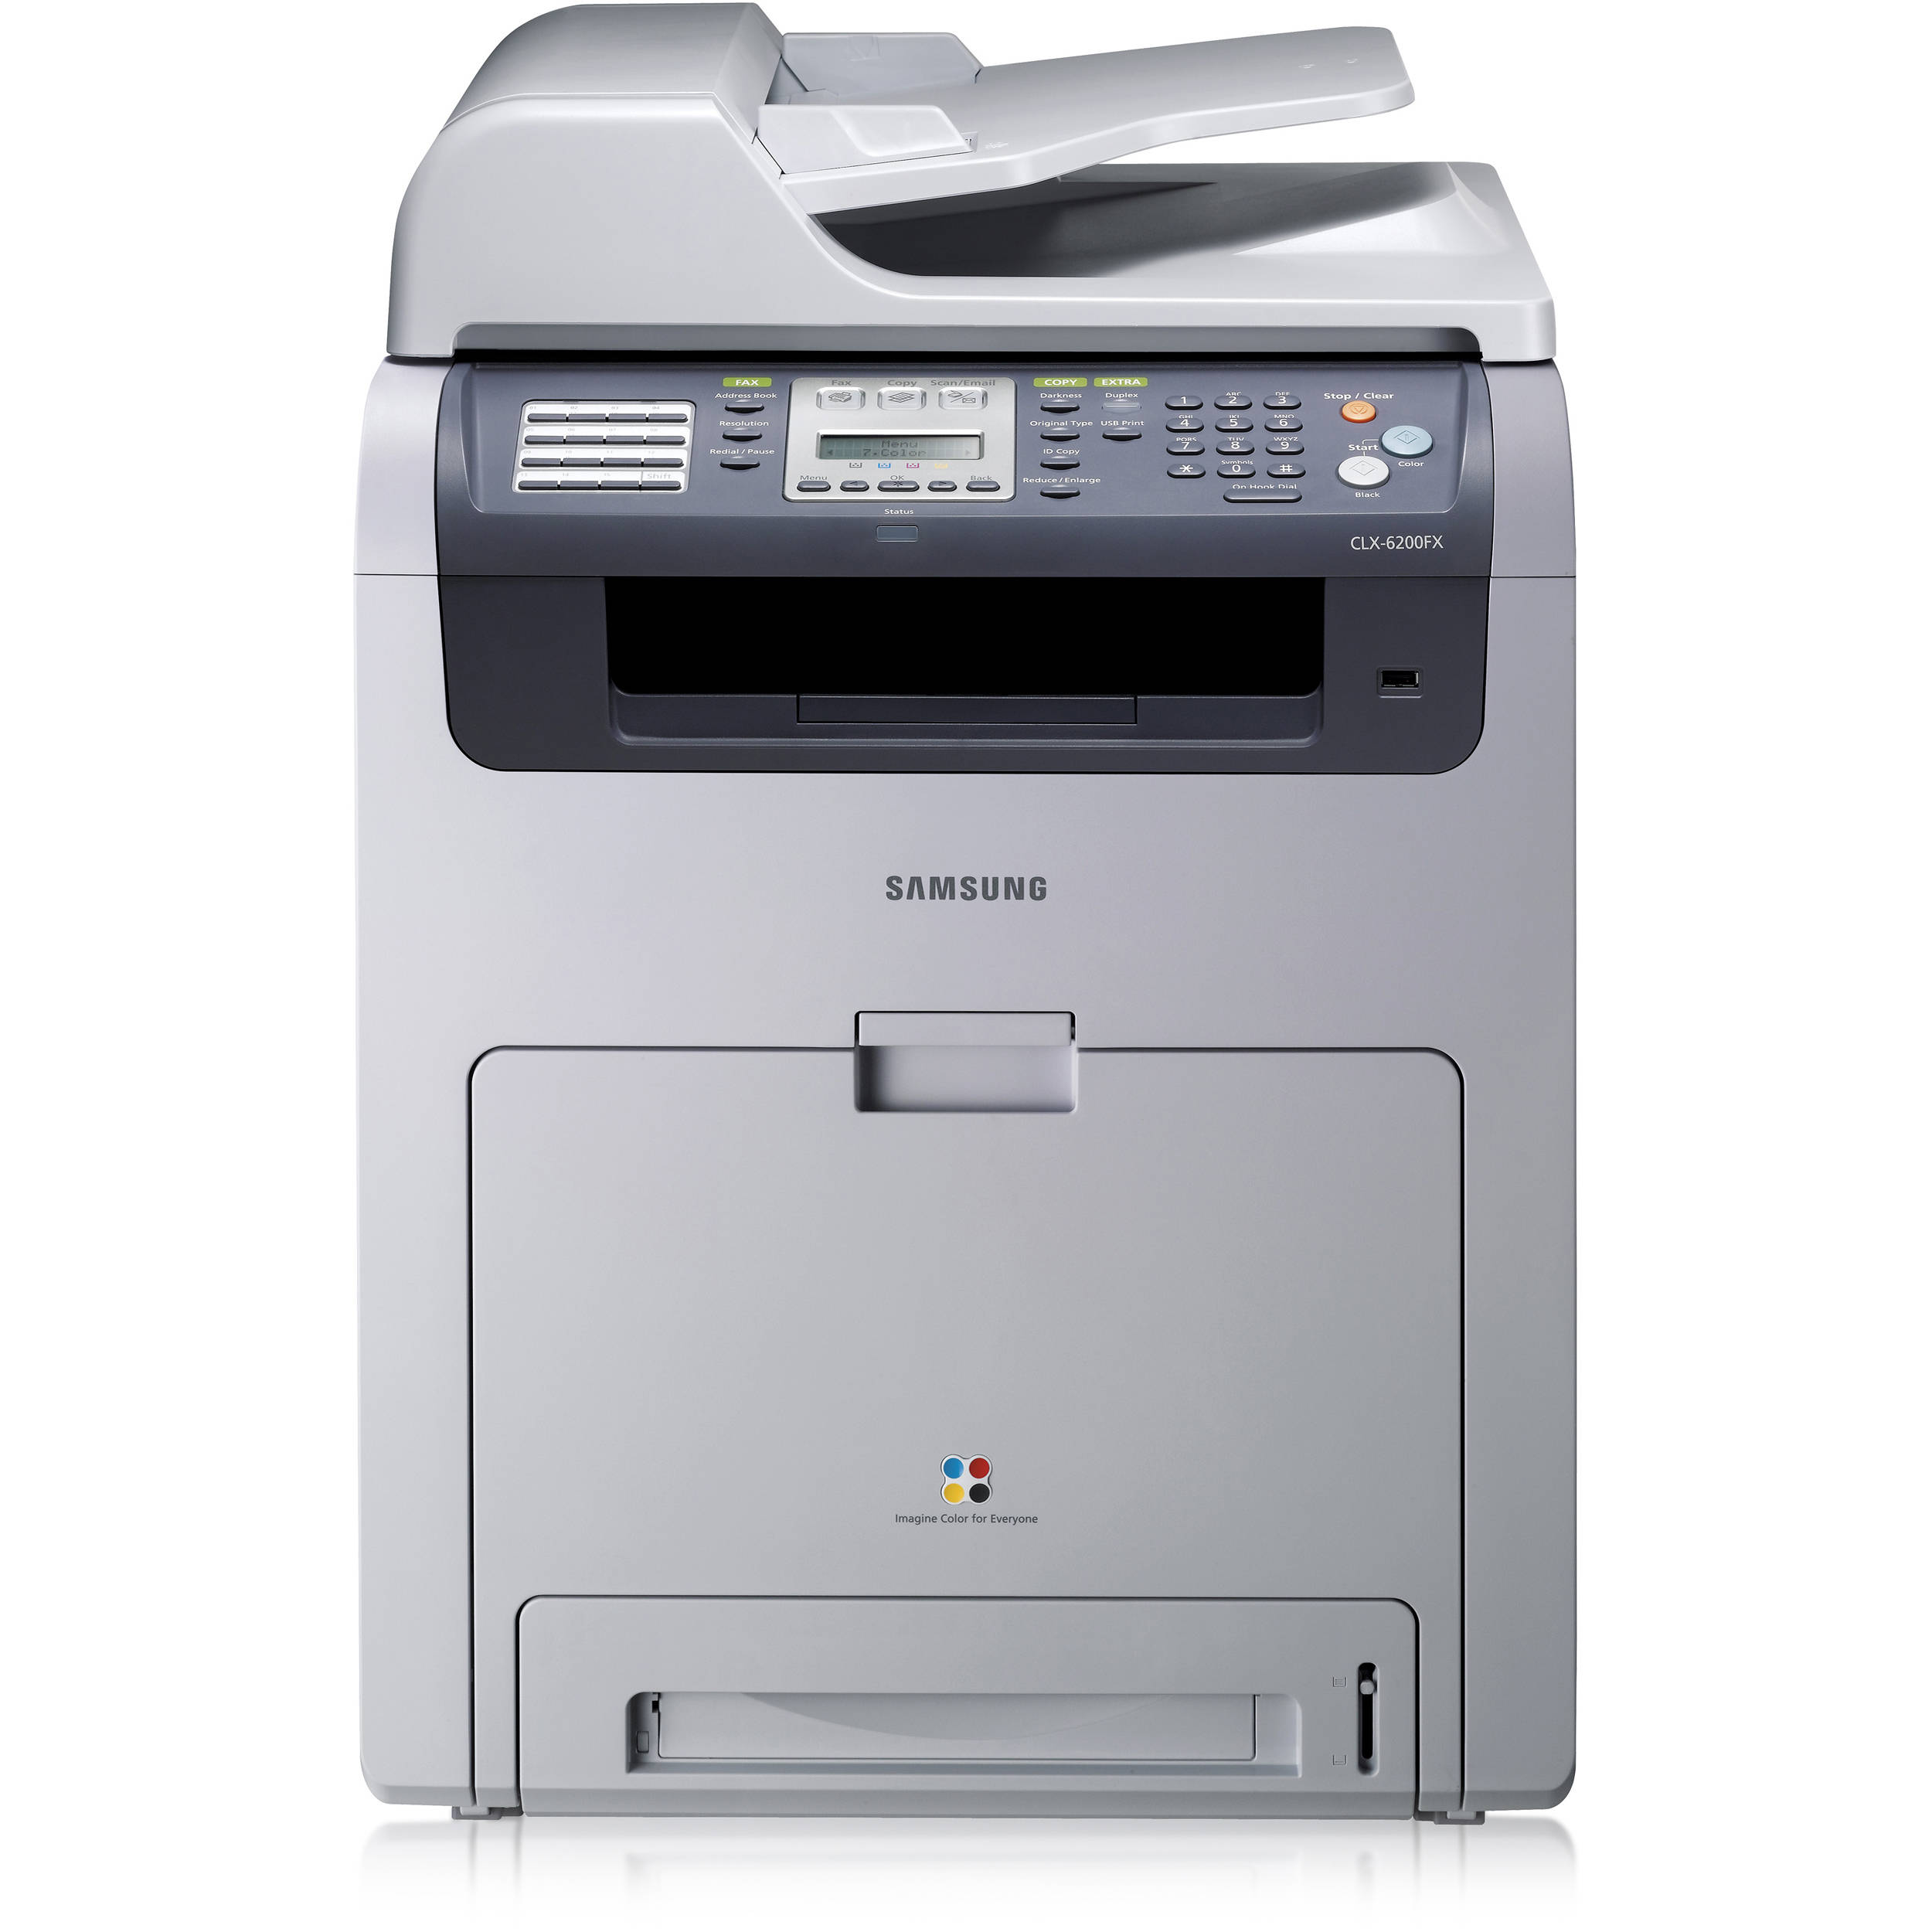 Samsung CLX-6200FX Printer Treiber Windows 10